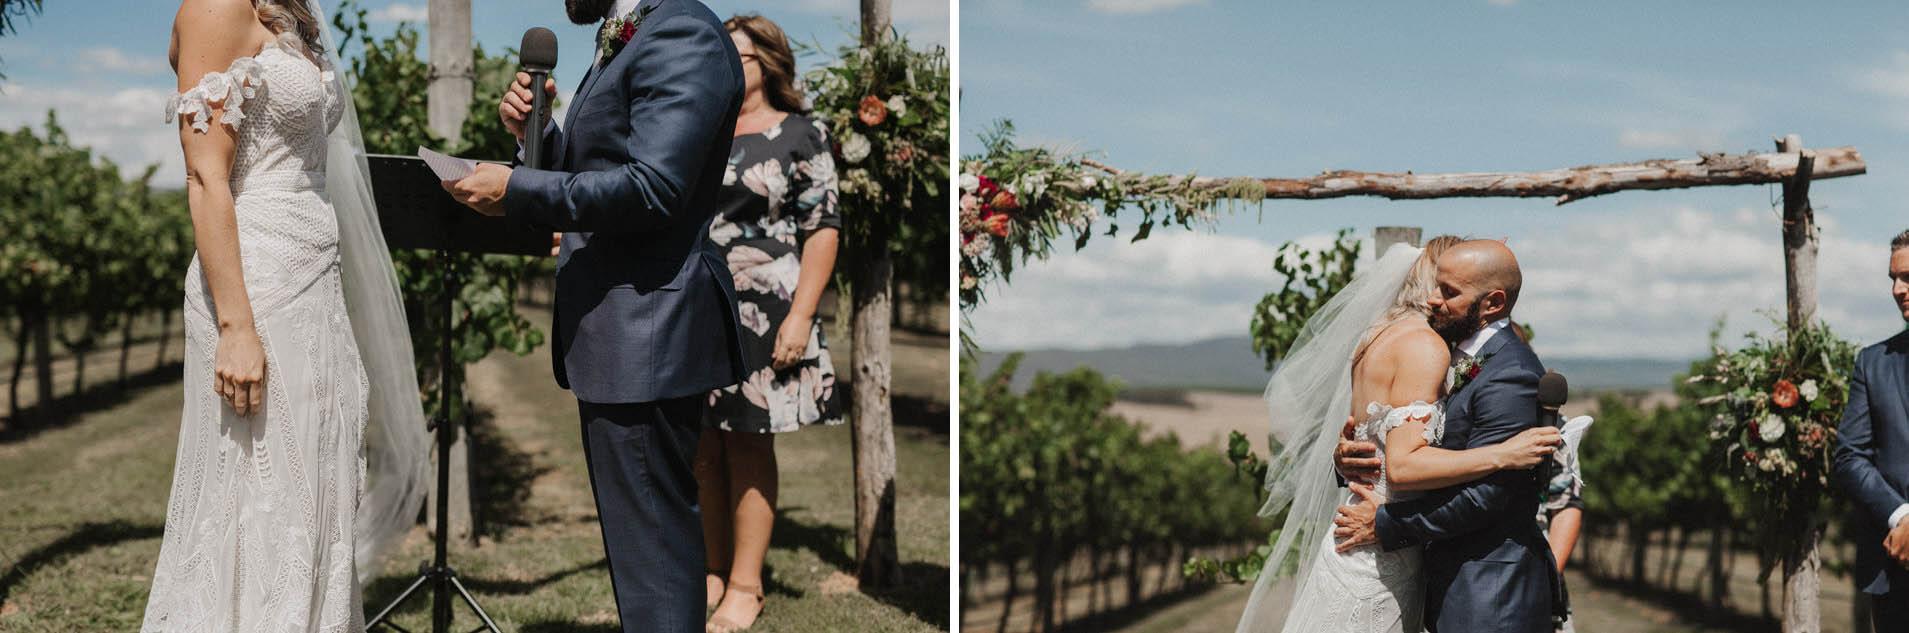 suger-pine-walk-wedding (Corinna & Dylan)_100(1121)2.jpg